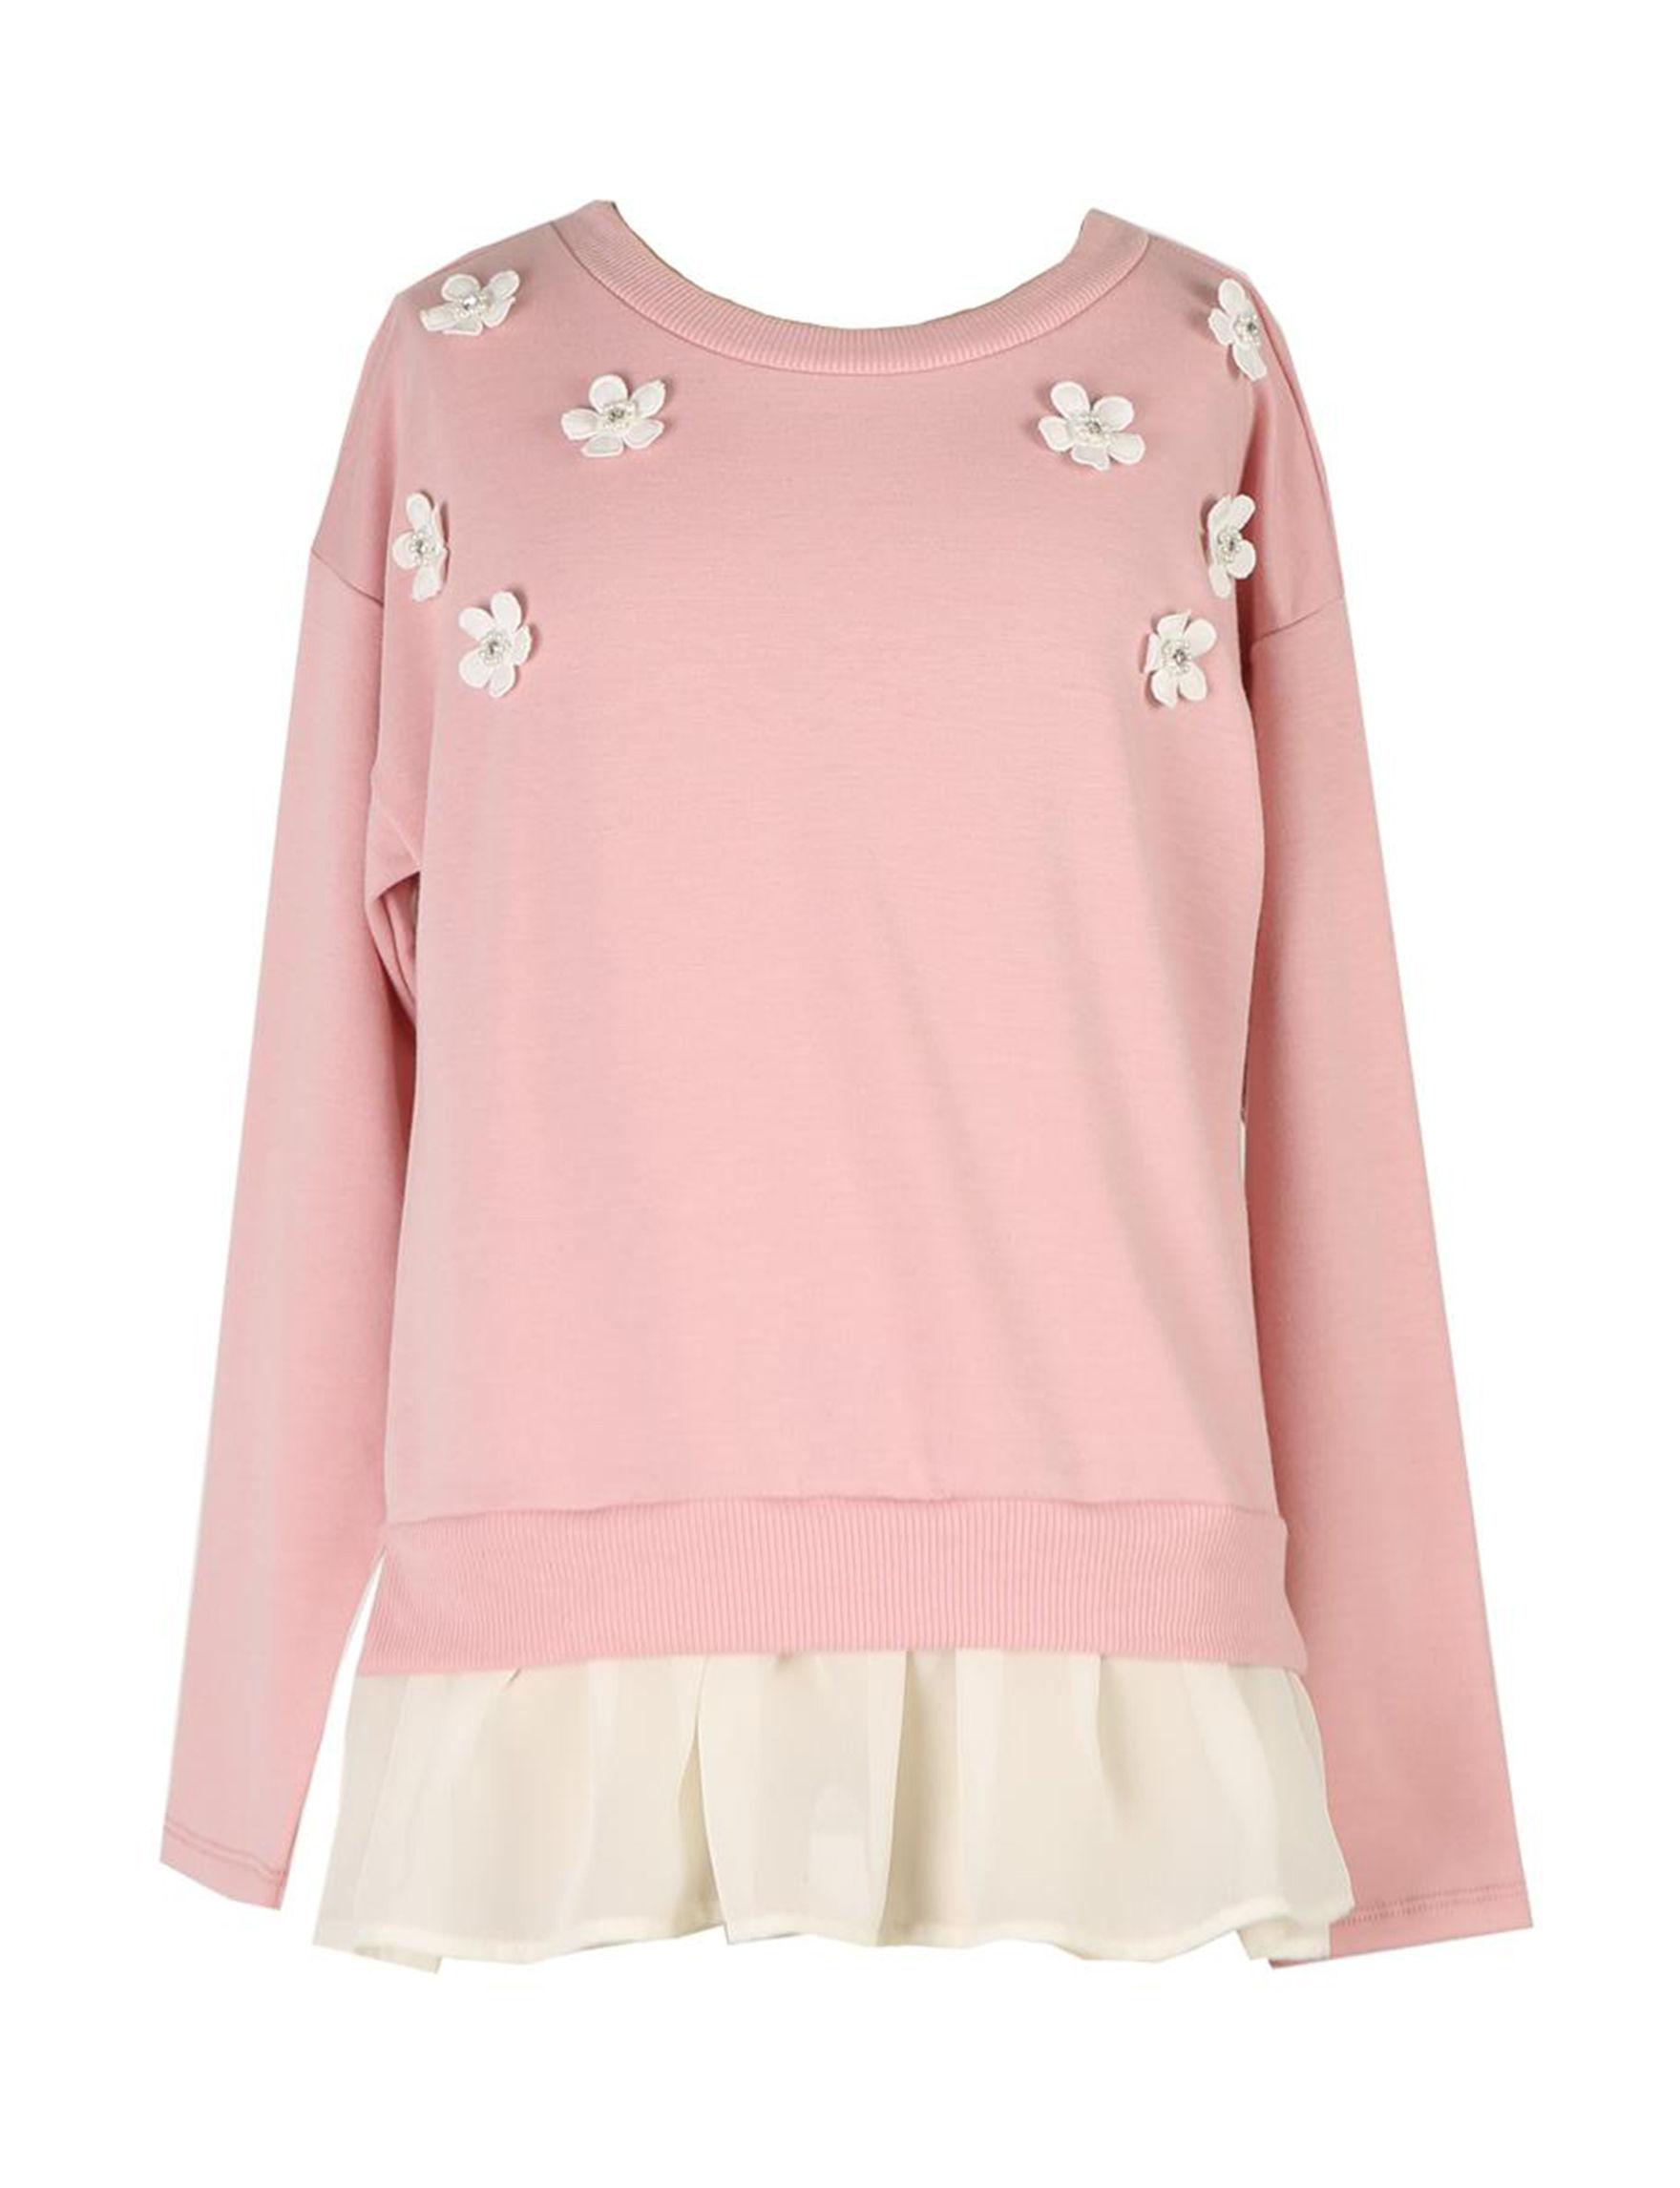 Speechless Pink / Ivory